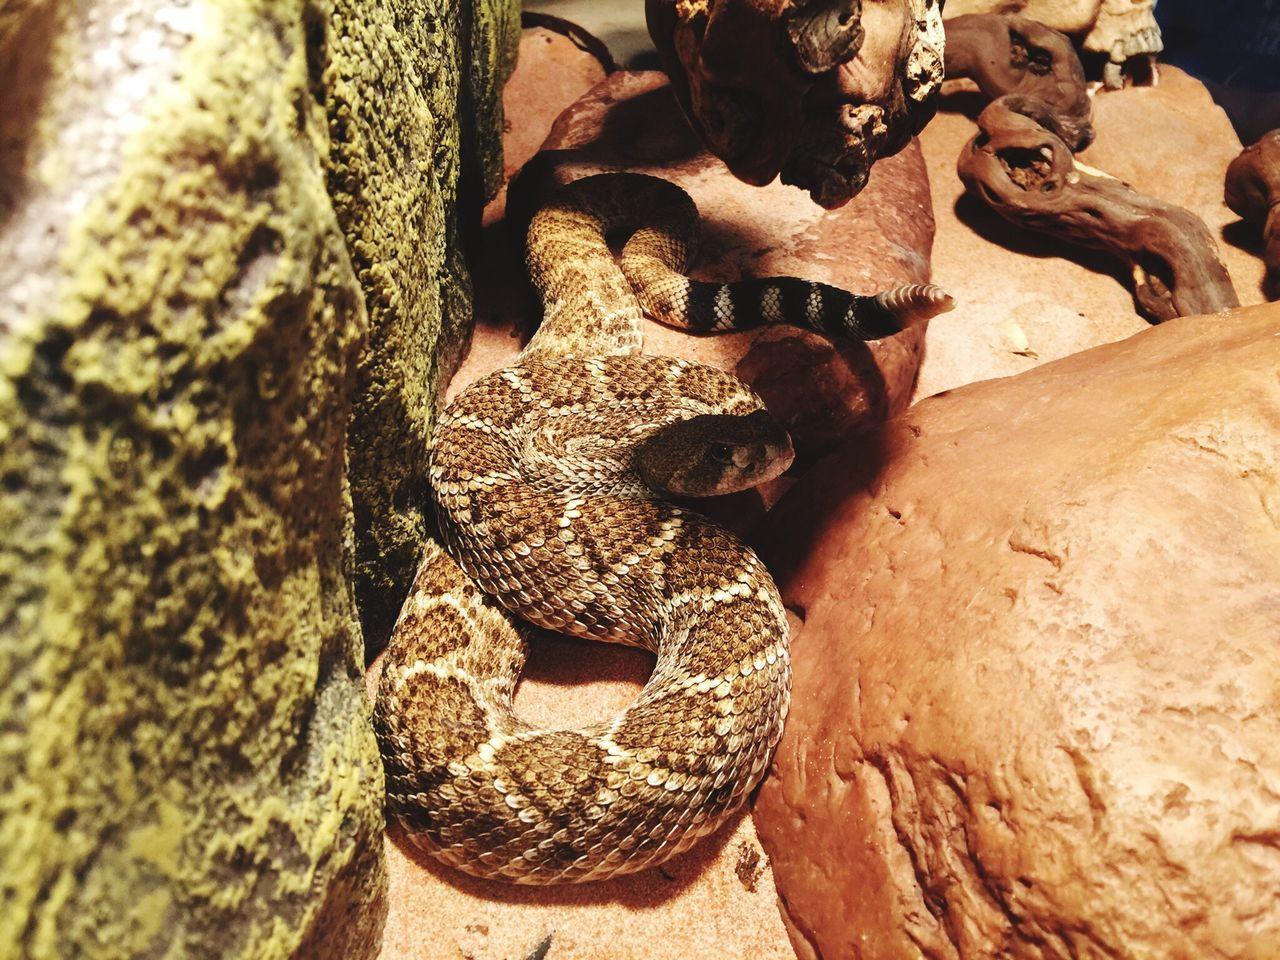 Crotalus Atrox Snake Schlange  Venomous Texas Klapperschlange Klapperschlange Gift